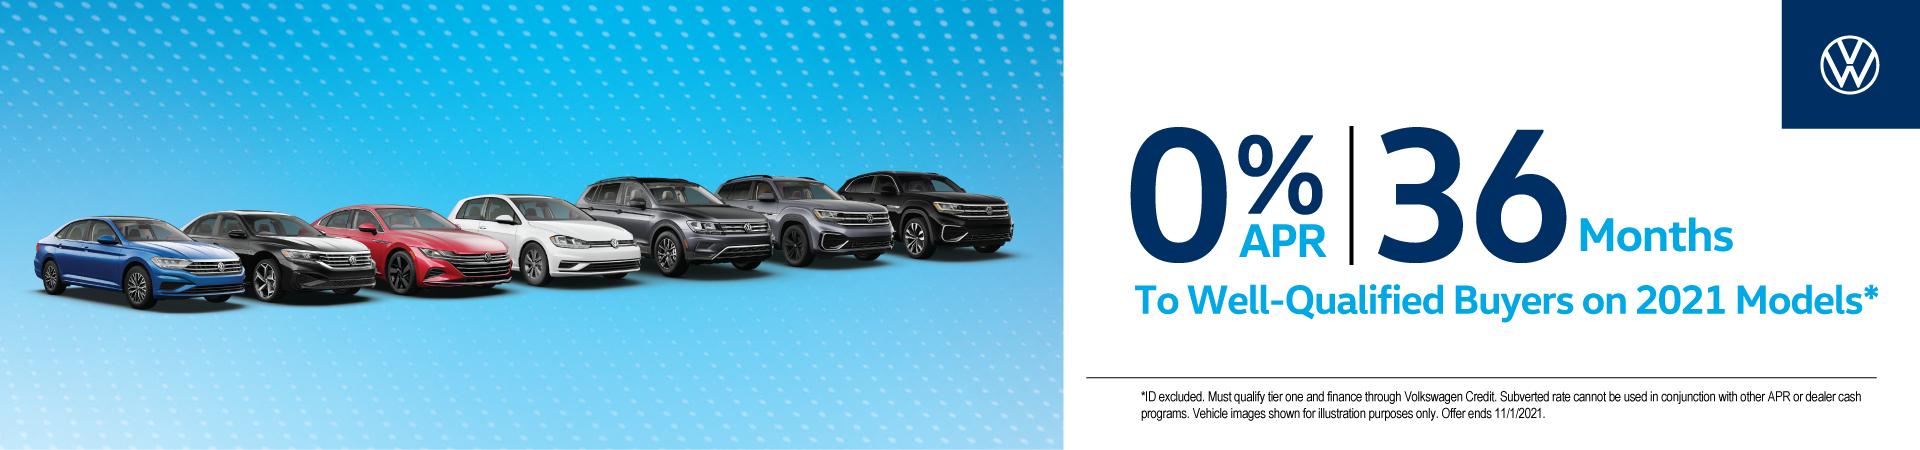 Oct-2021-VW-CS-Slides_0-APR-60-MO